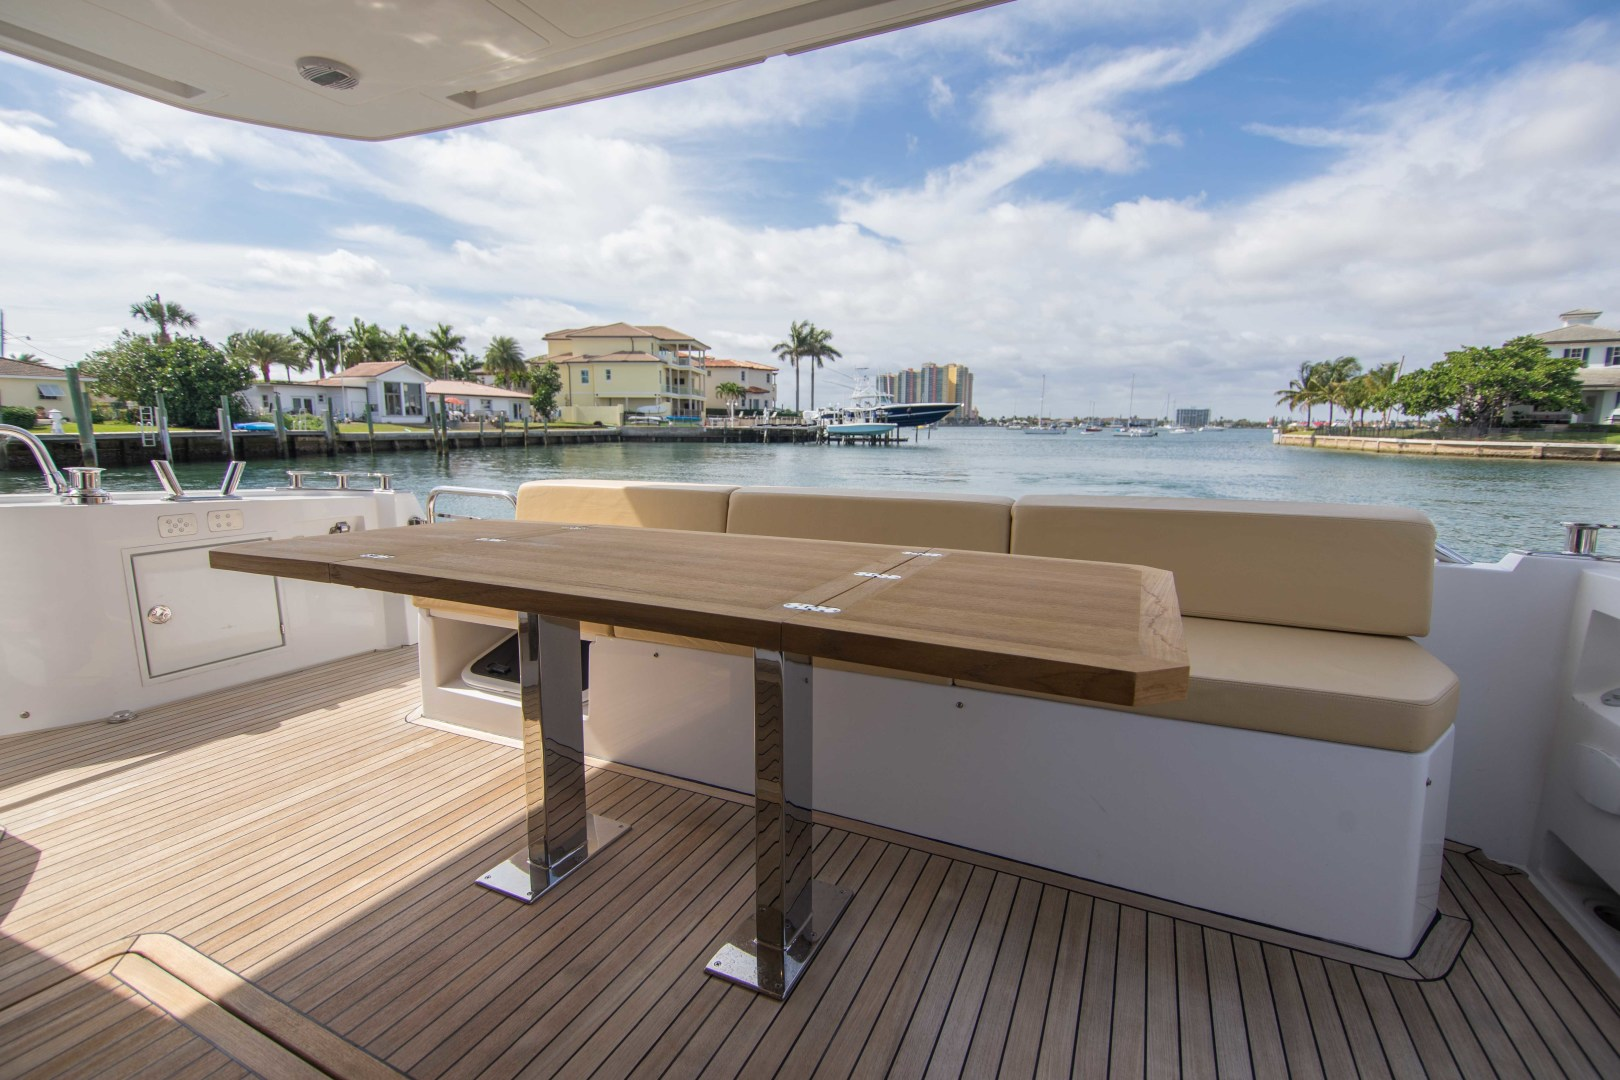 Sundeck-58 Sport 2019-LJ IV Singer Island-Florida-United States-Aft Deck-1373065 | Thumbnail